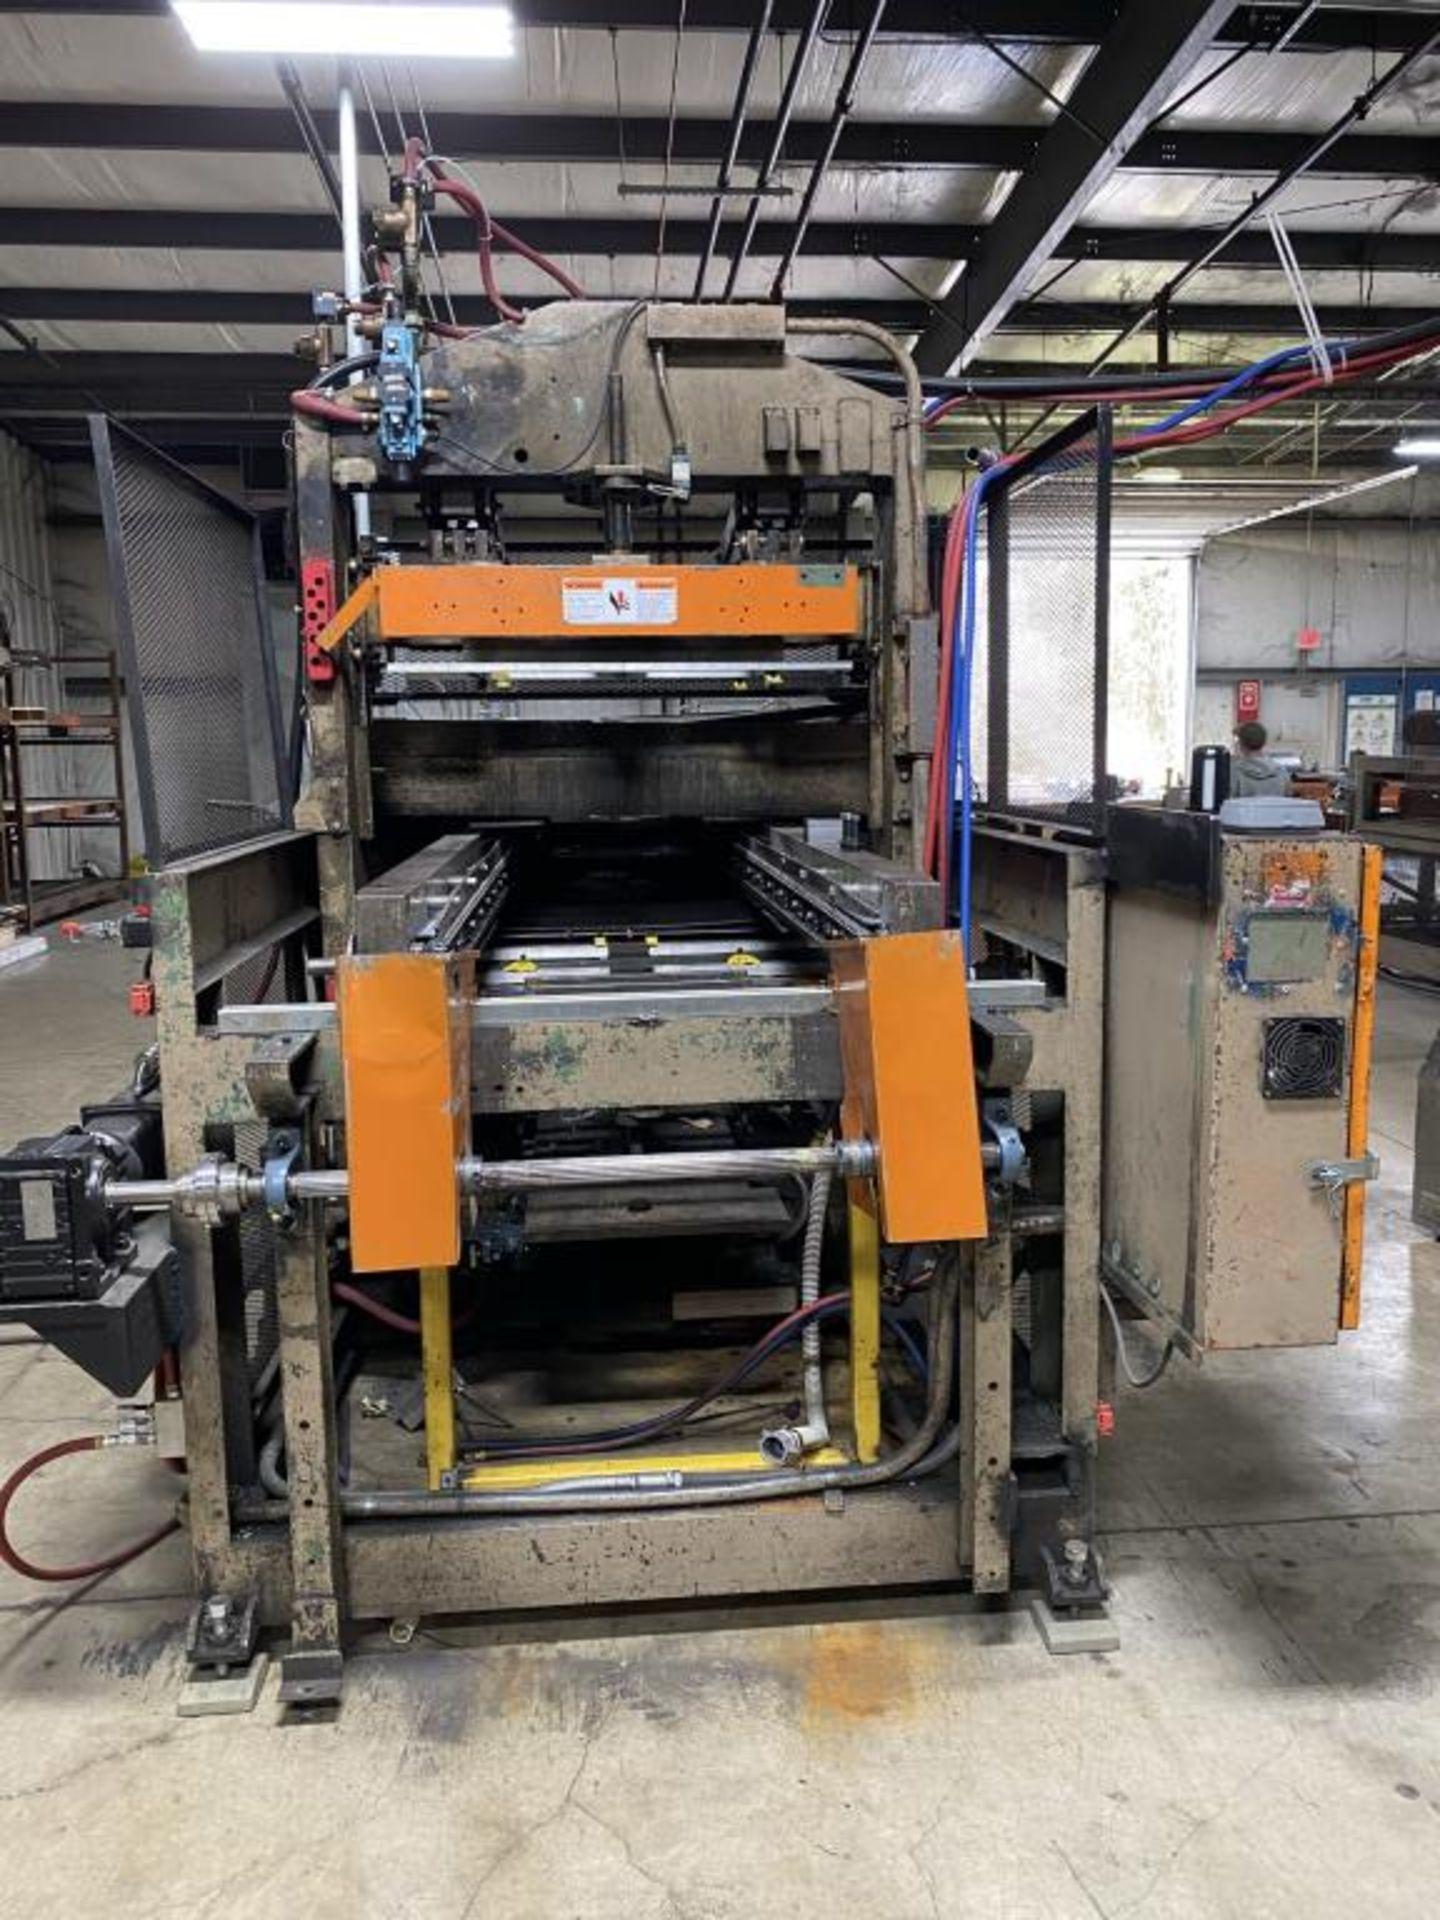 Rebuilt Thin Gauge Thermoformer - Image 3 of 26